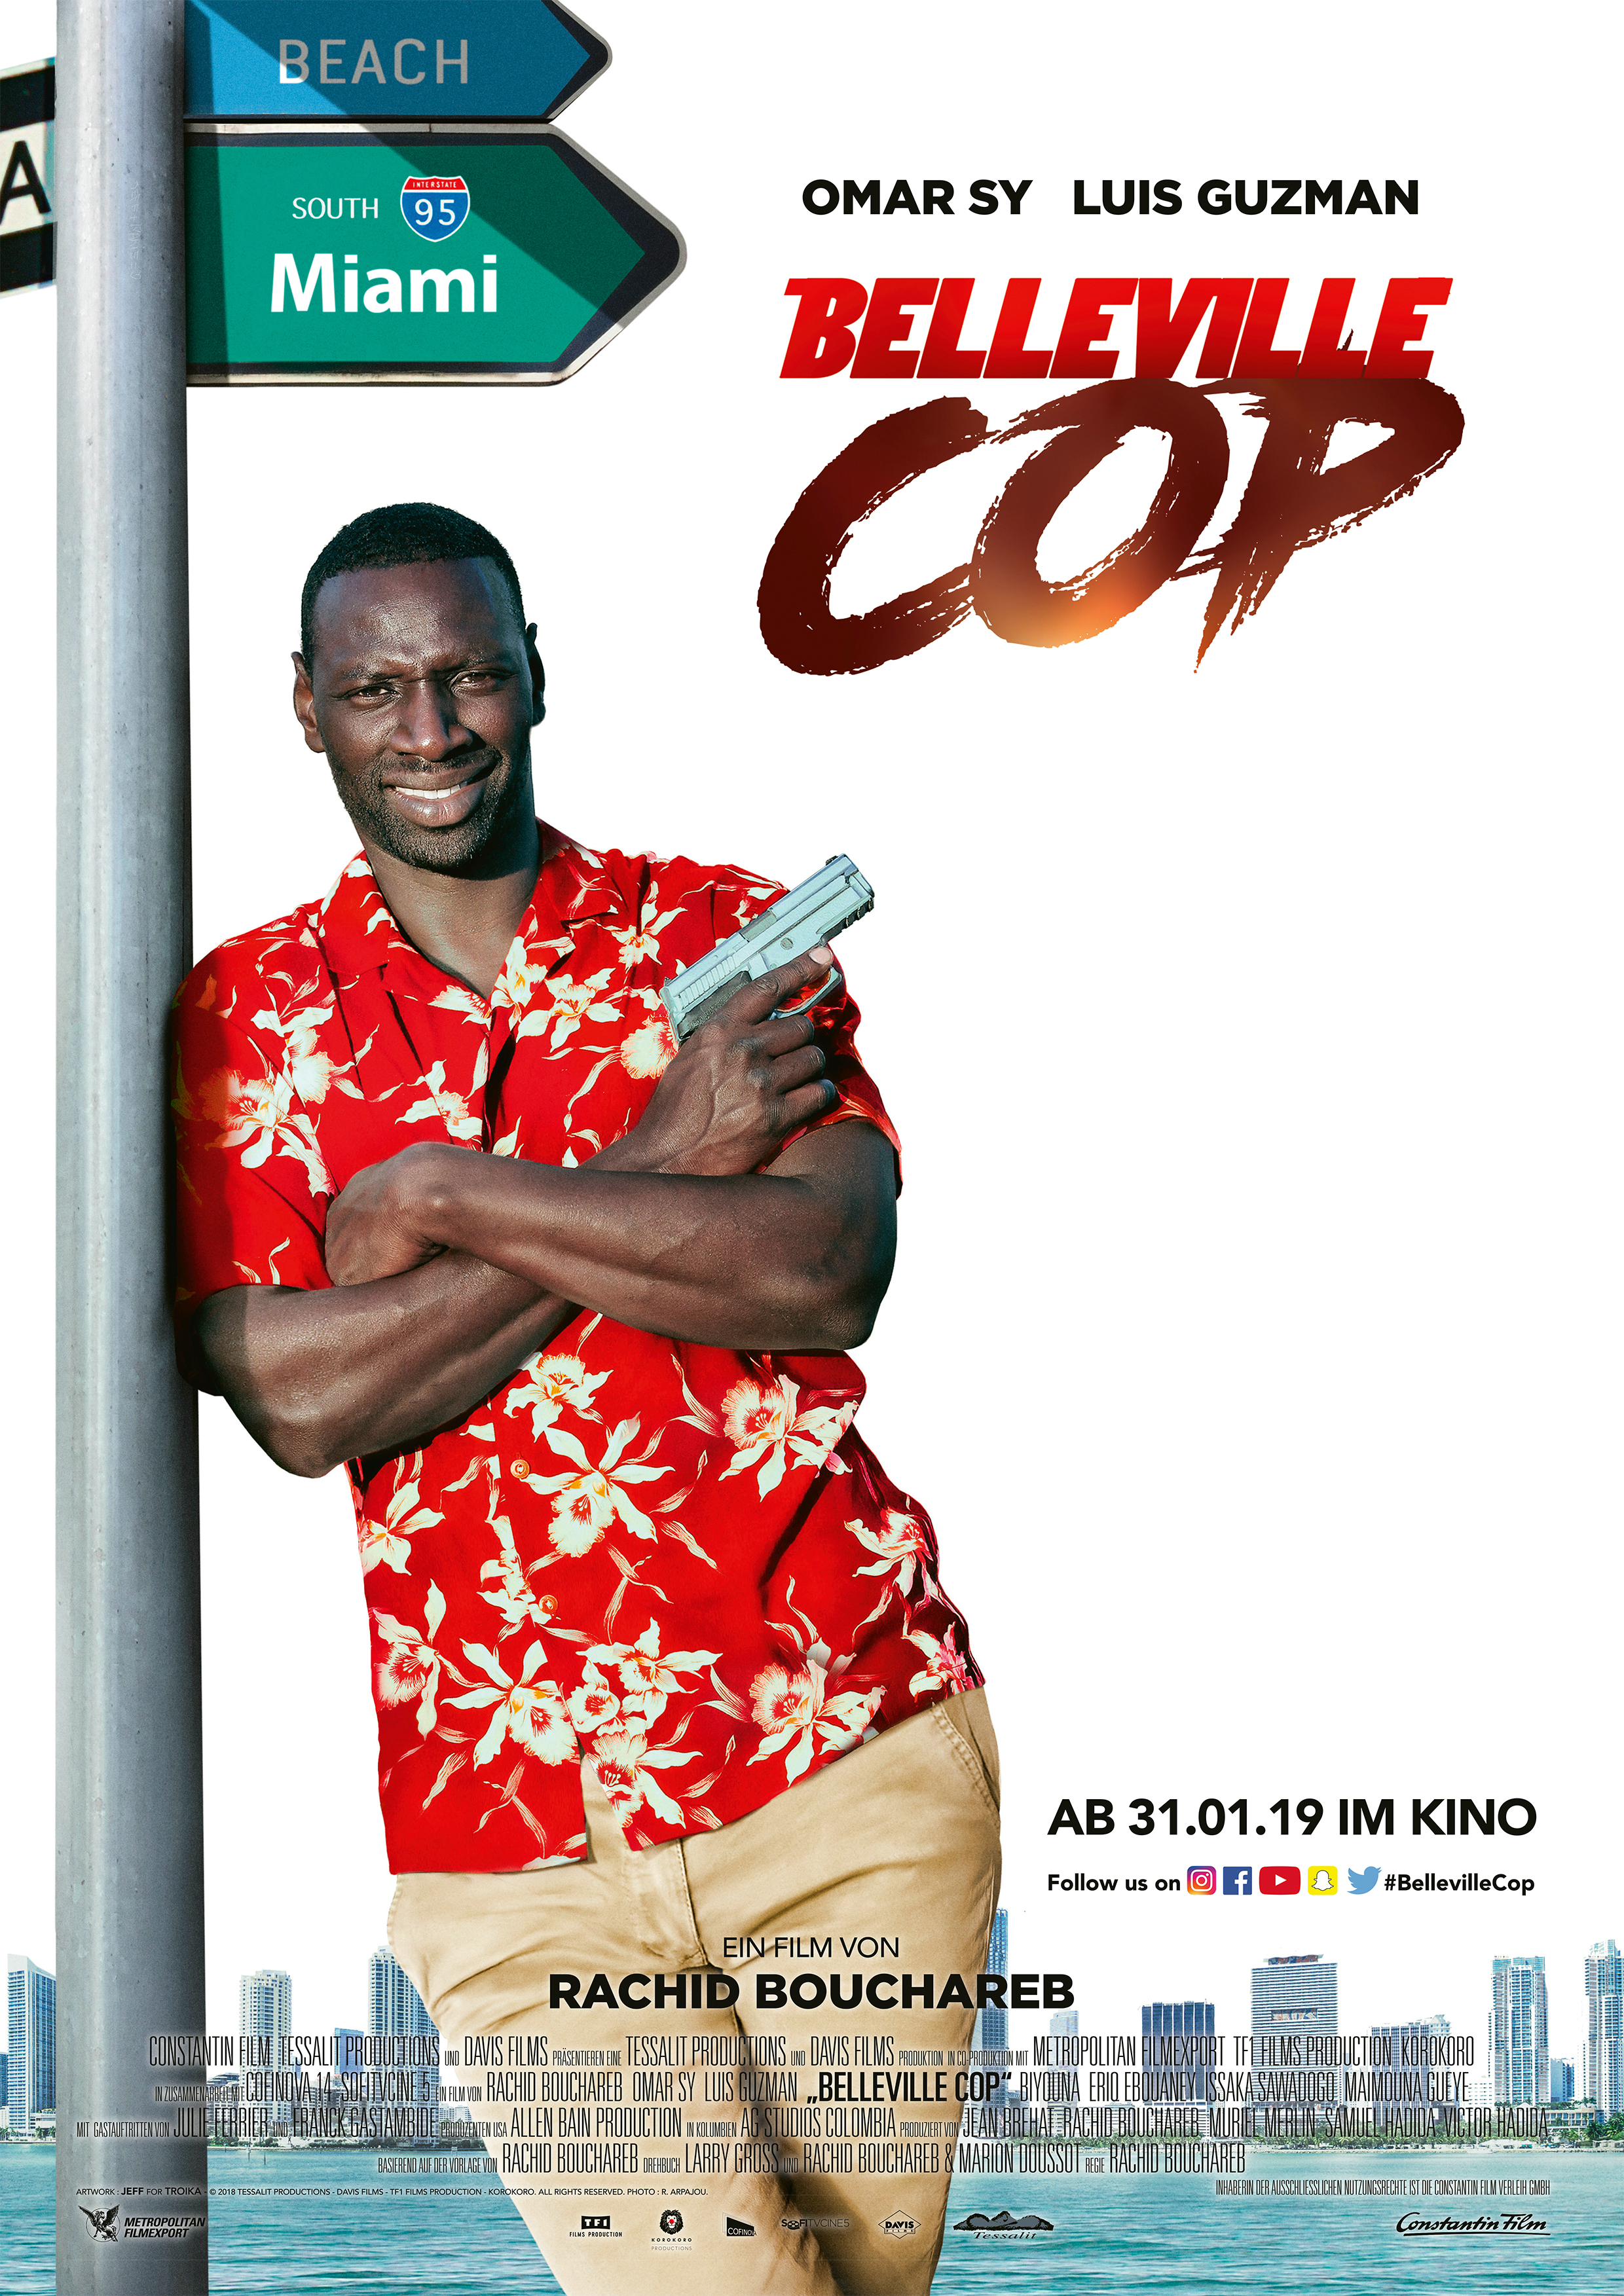 Omar Sy Ist Der Belleville Cop Ab 31 Januar 2019 Im Kino